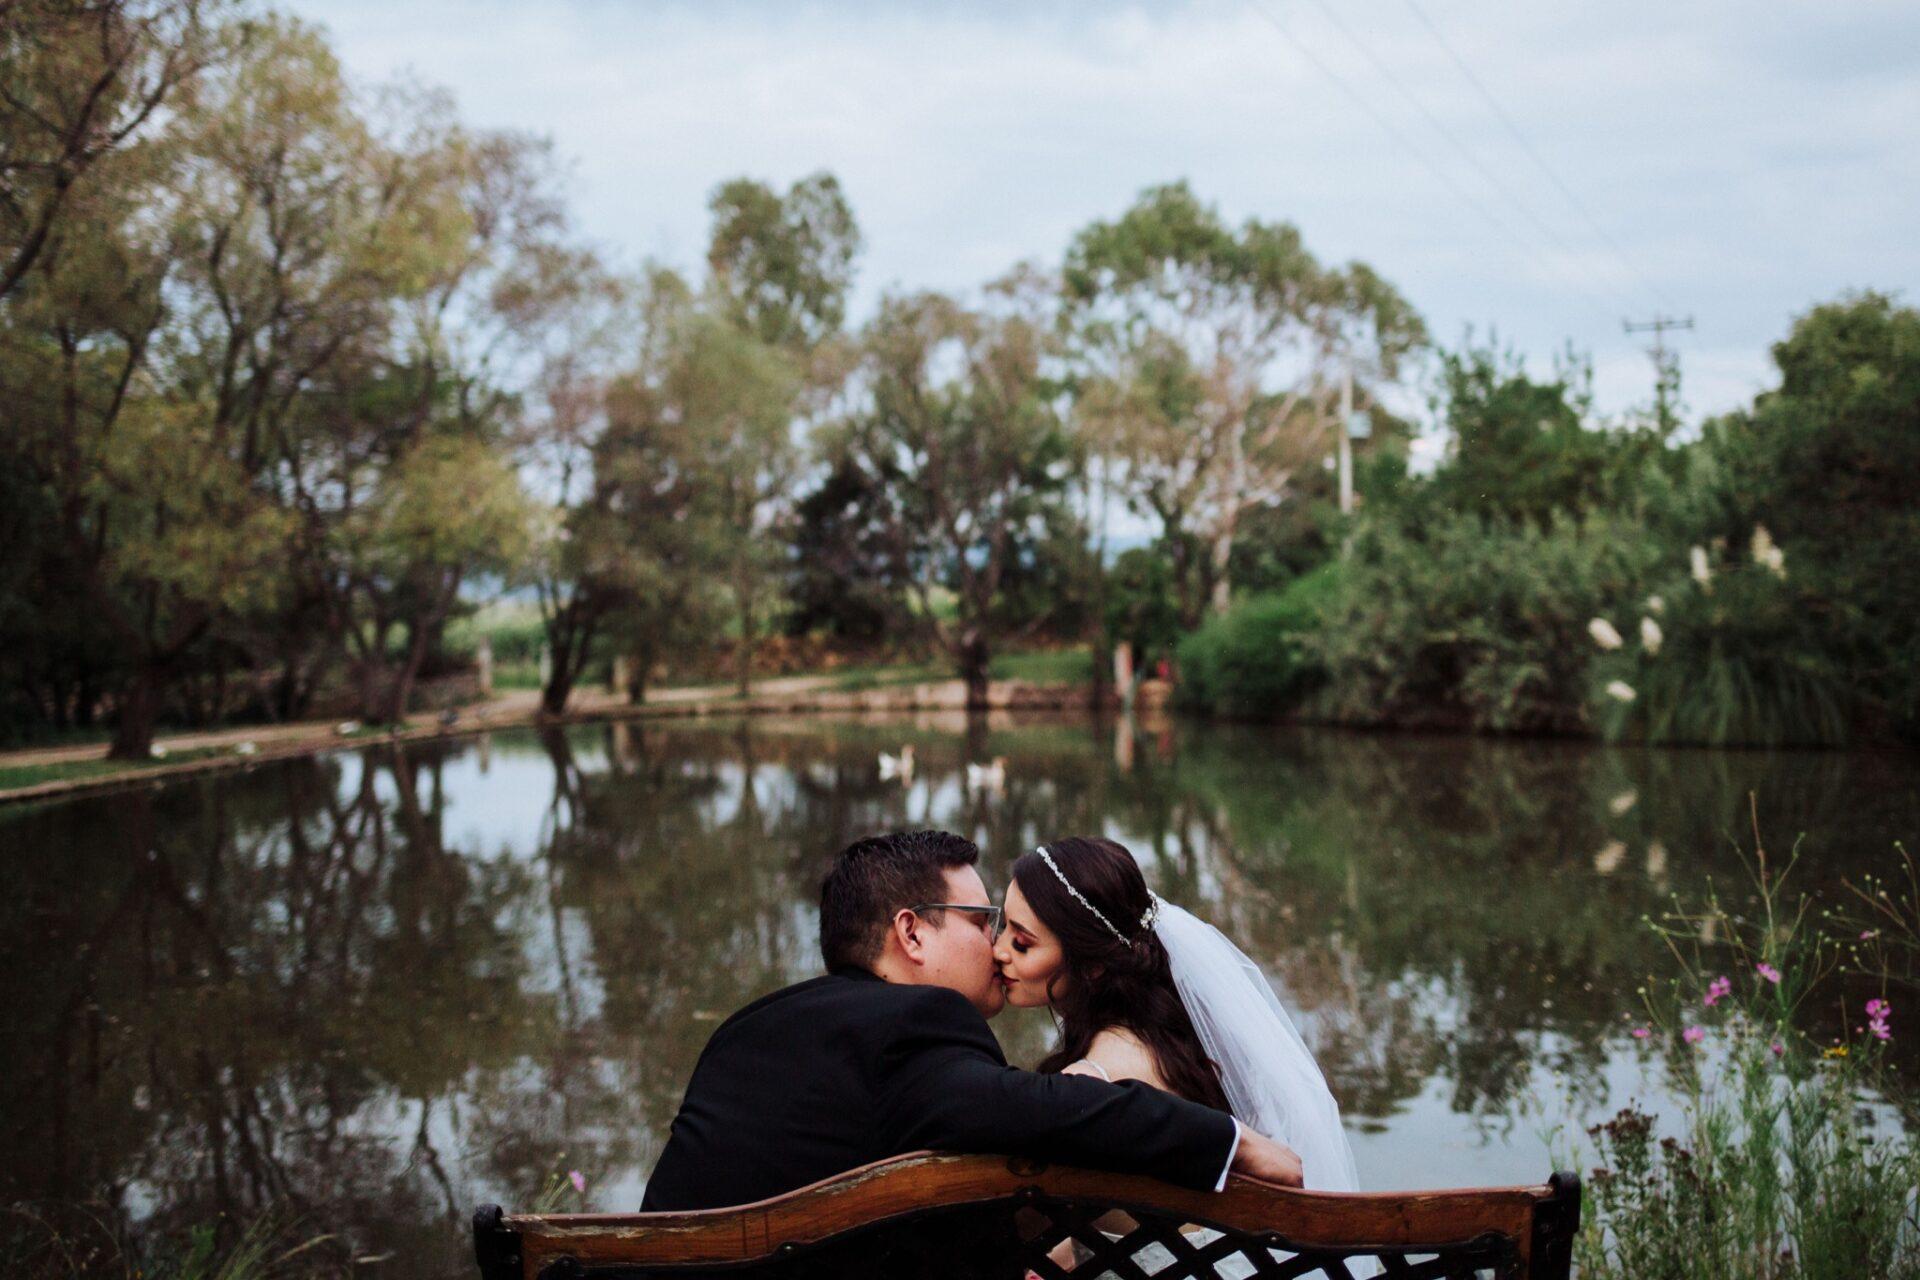 javier_noriega_fotografo_bodas_teul_zacatecas_wedding_photographer29